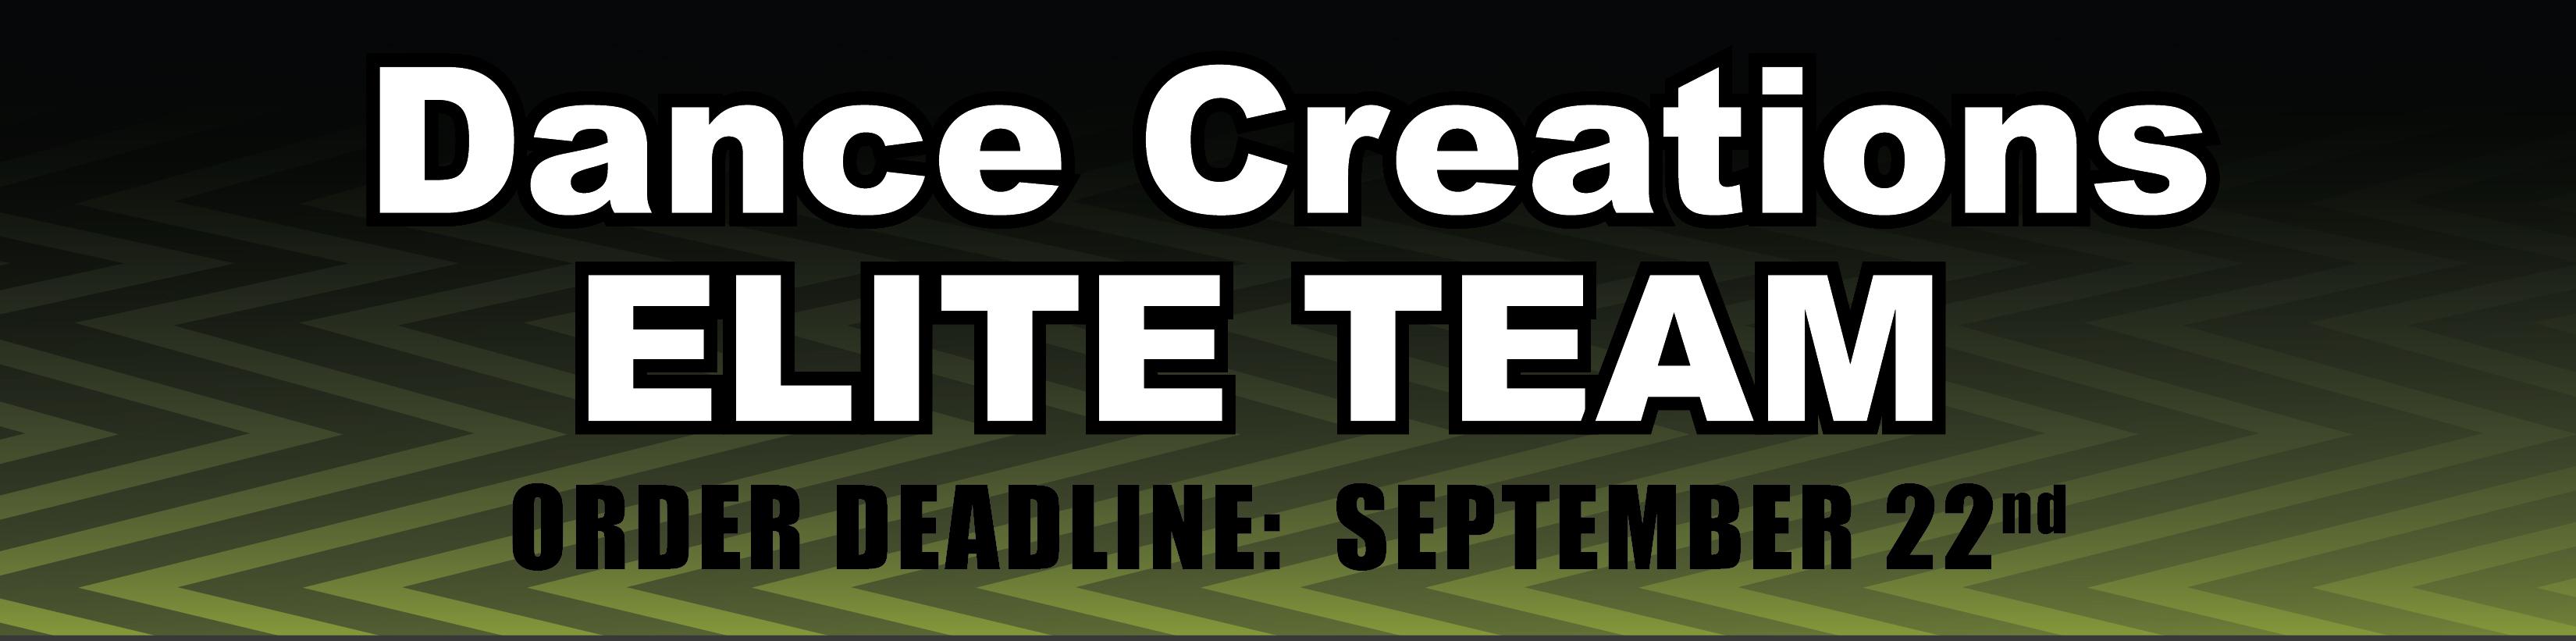 Dance Creations Elite Team